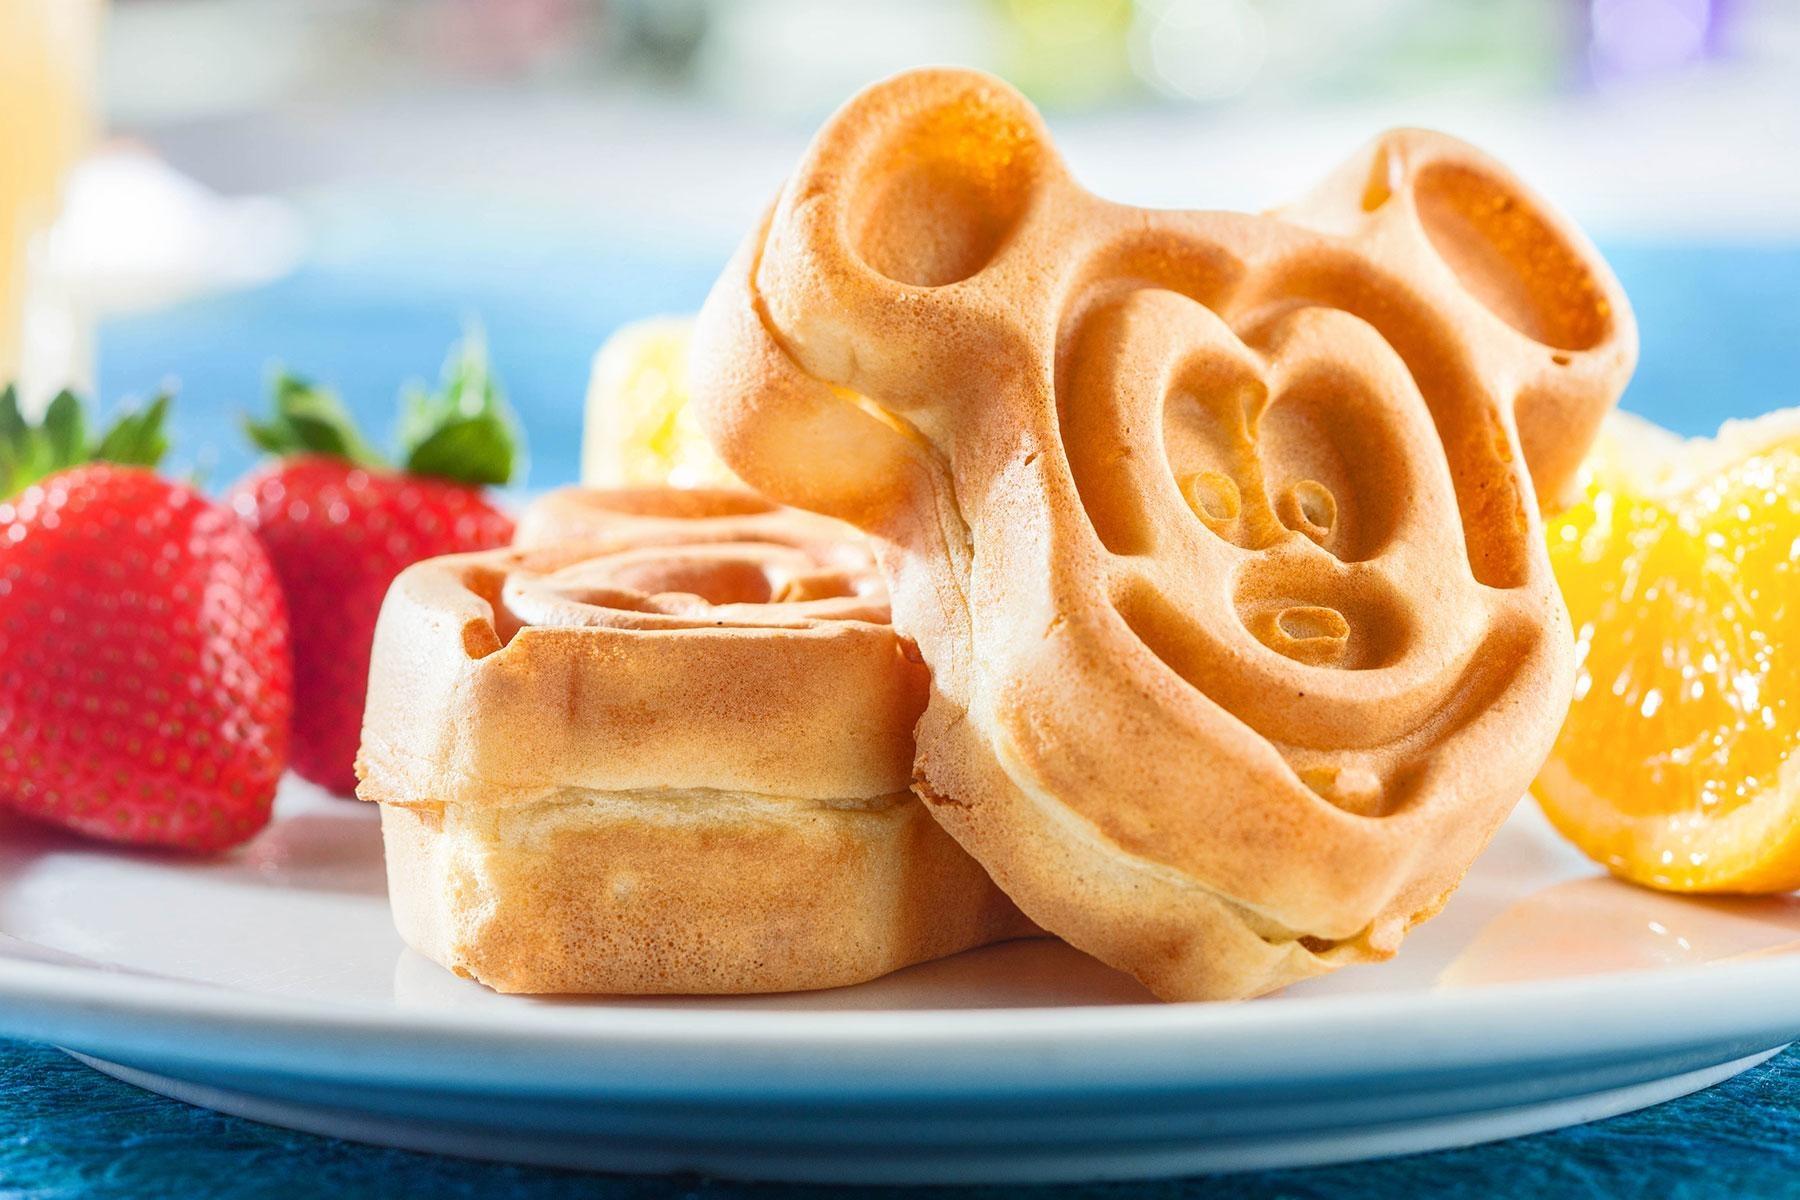 Loat mon ngon tai hien cac nhan vat Disney hinh anh 12 13_MickeyShapedFoods_MickeyWaffle_Mickey_Waffle_1.jpg